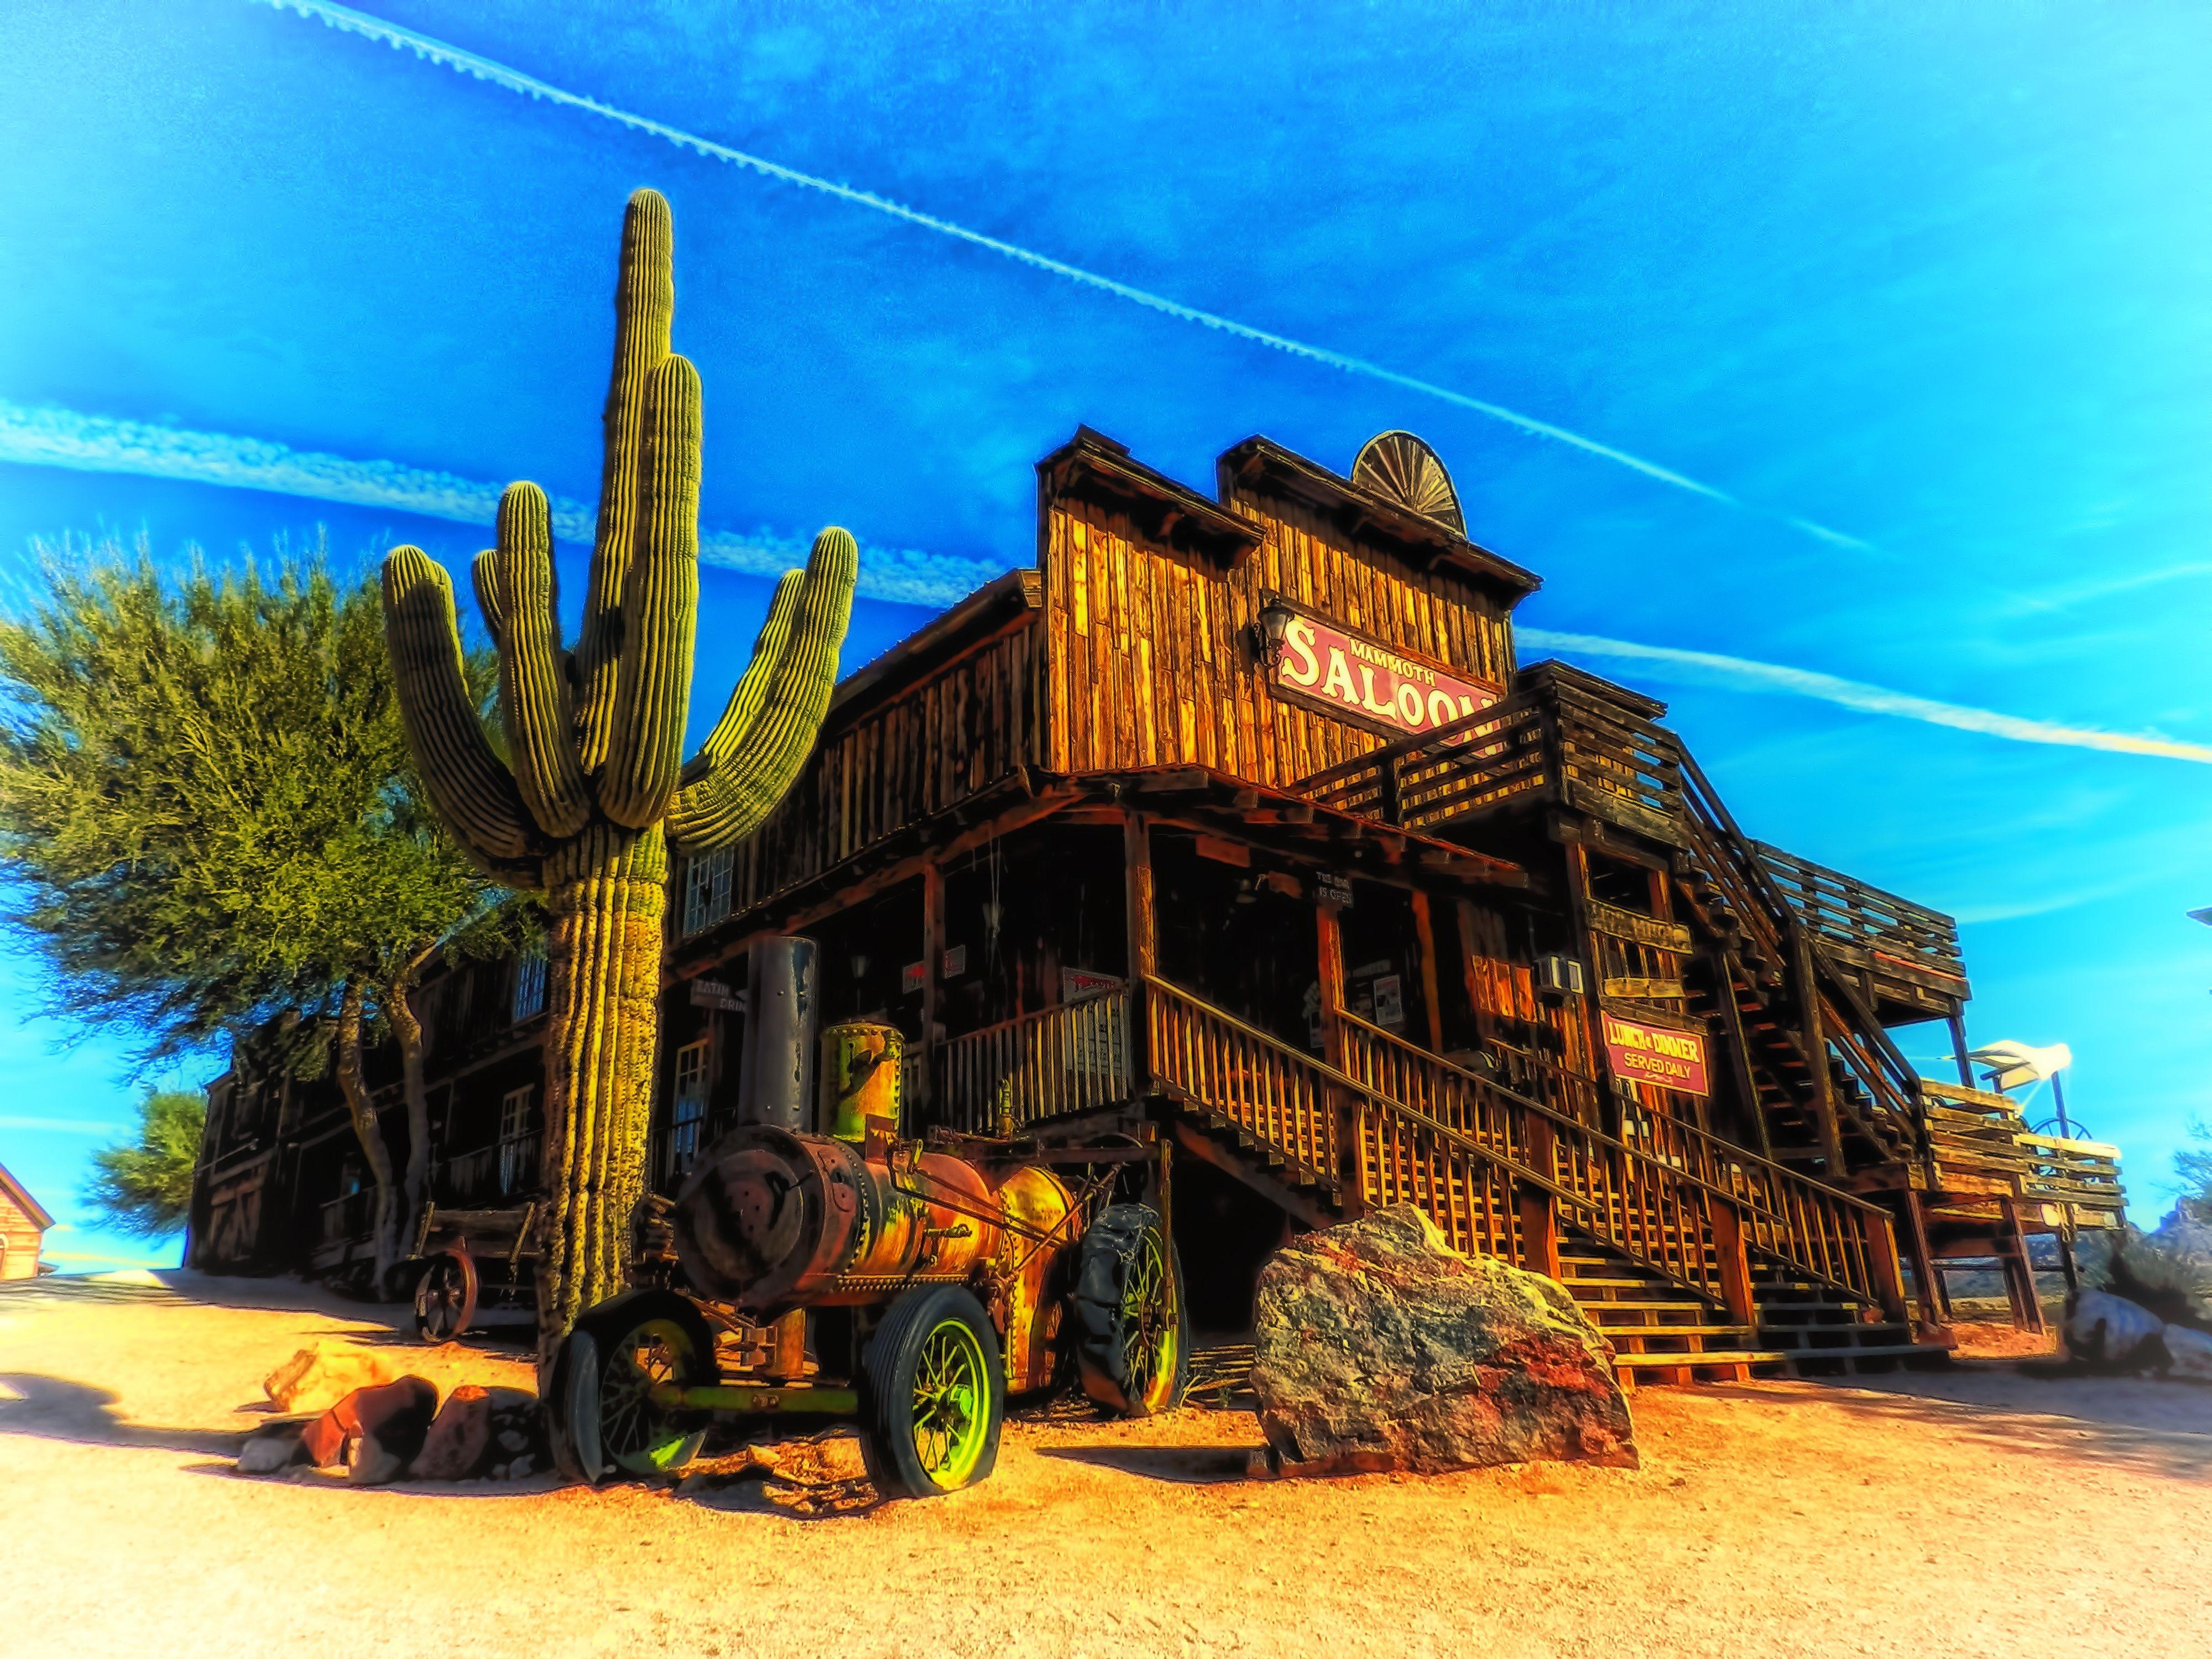 Arizona saloon cactus landscape western hdr f wallpaper 4000x3000 4000x3000